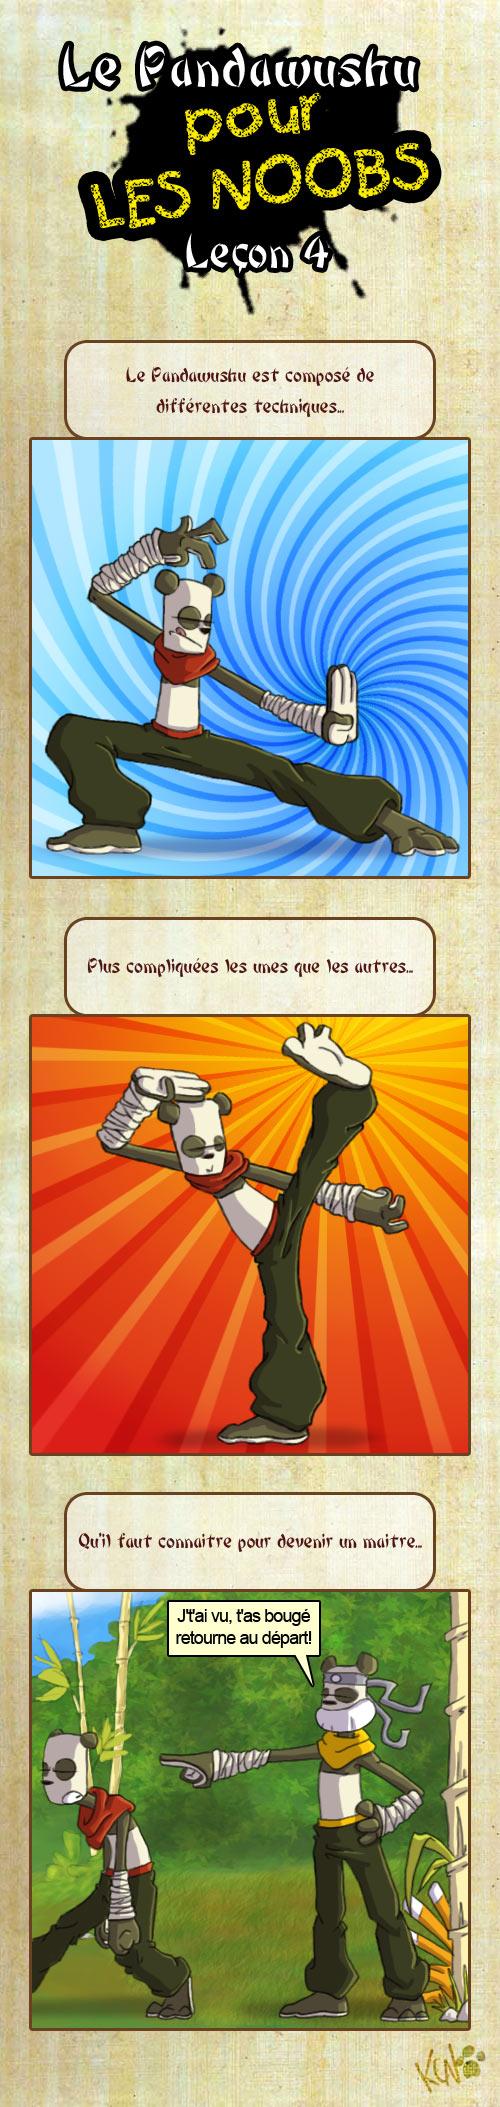 Le Pandawushu pour les Noobs Pandawushu04